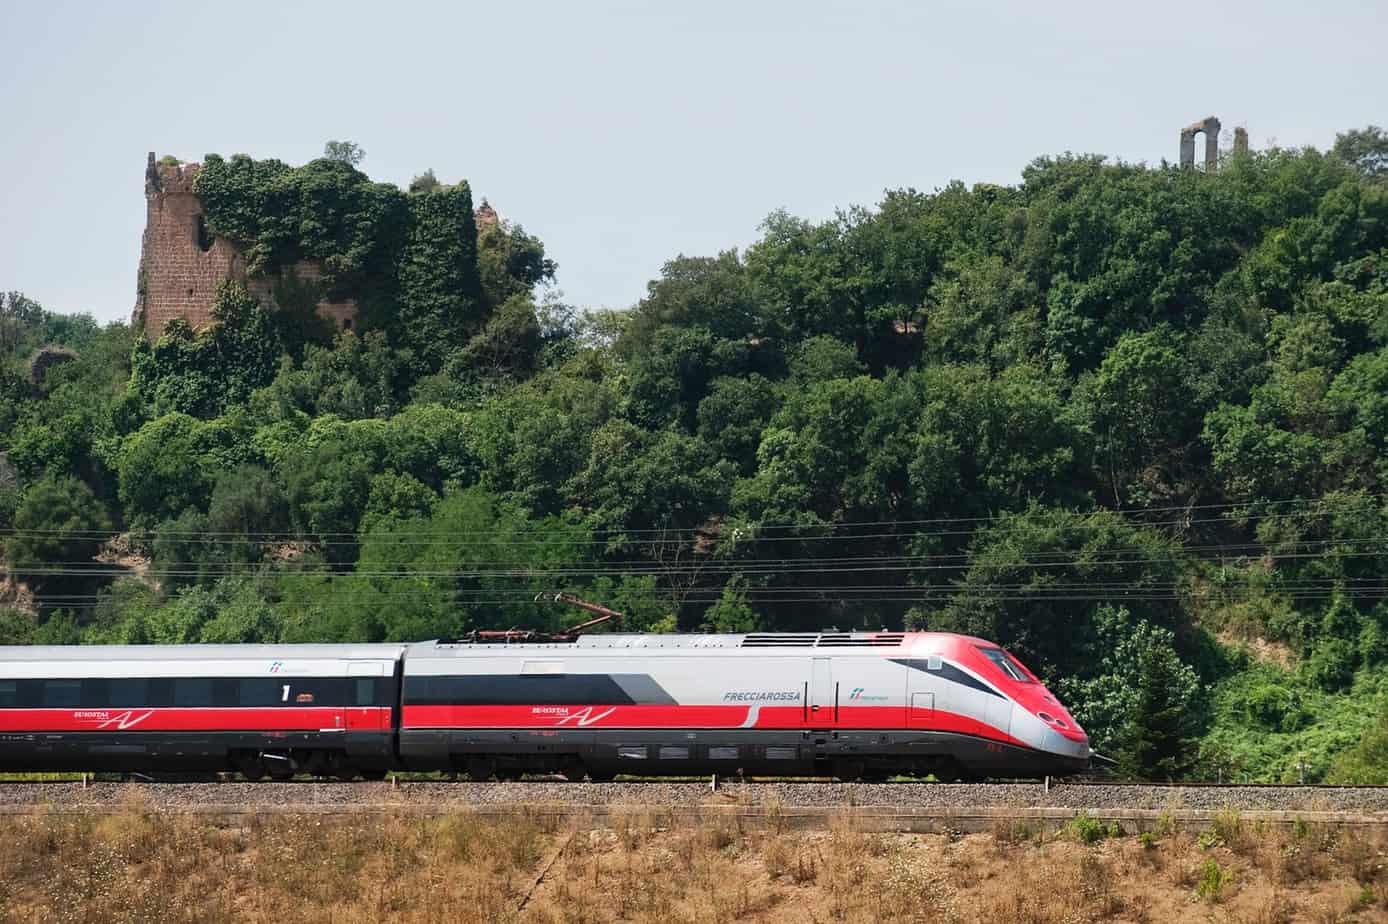 Una nuova linea per i nuovi treni